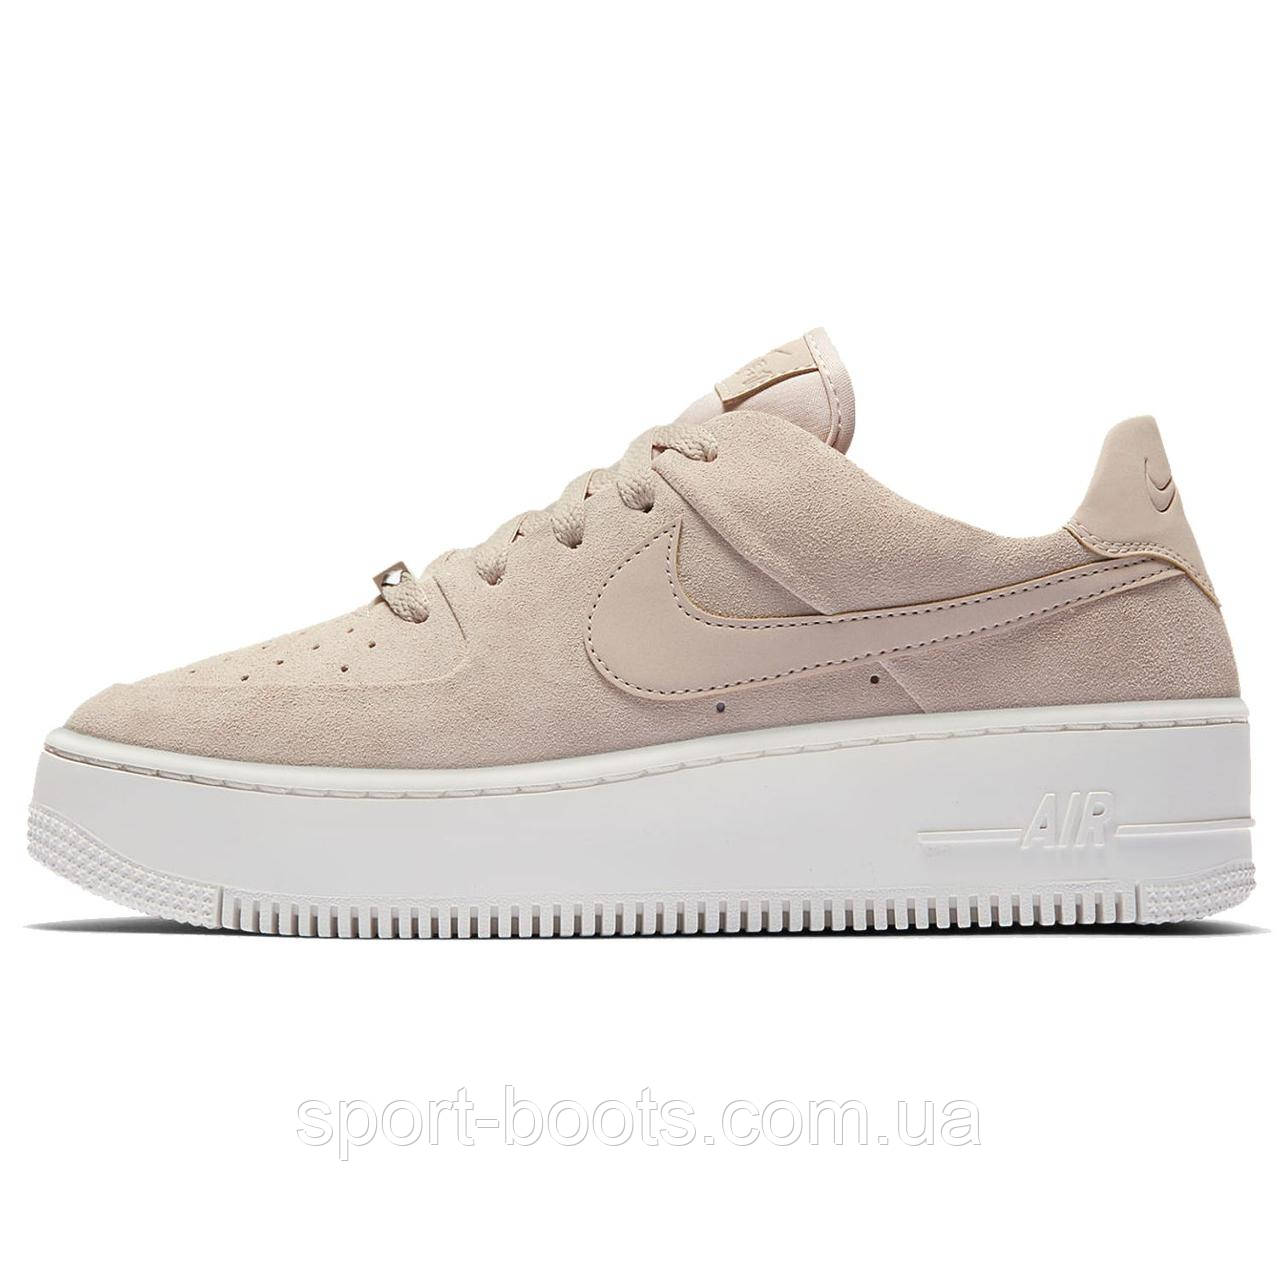 e6a090bd Оригинальные женские кроссовки Nike Air Force 1 Sage Low: продажа ...